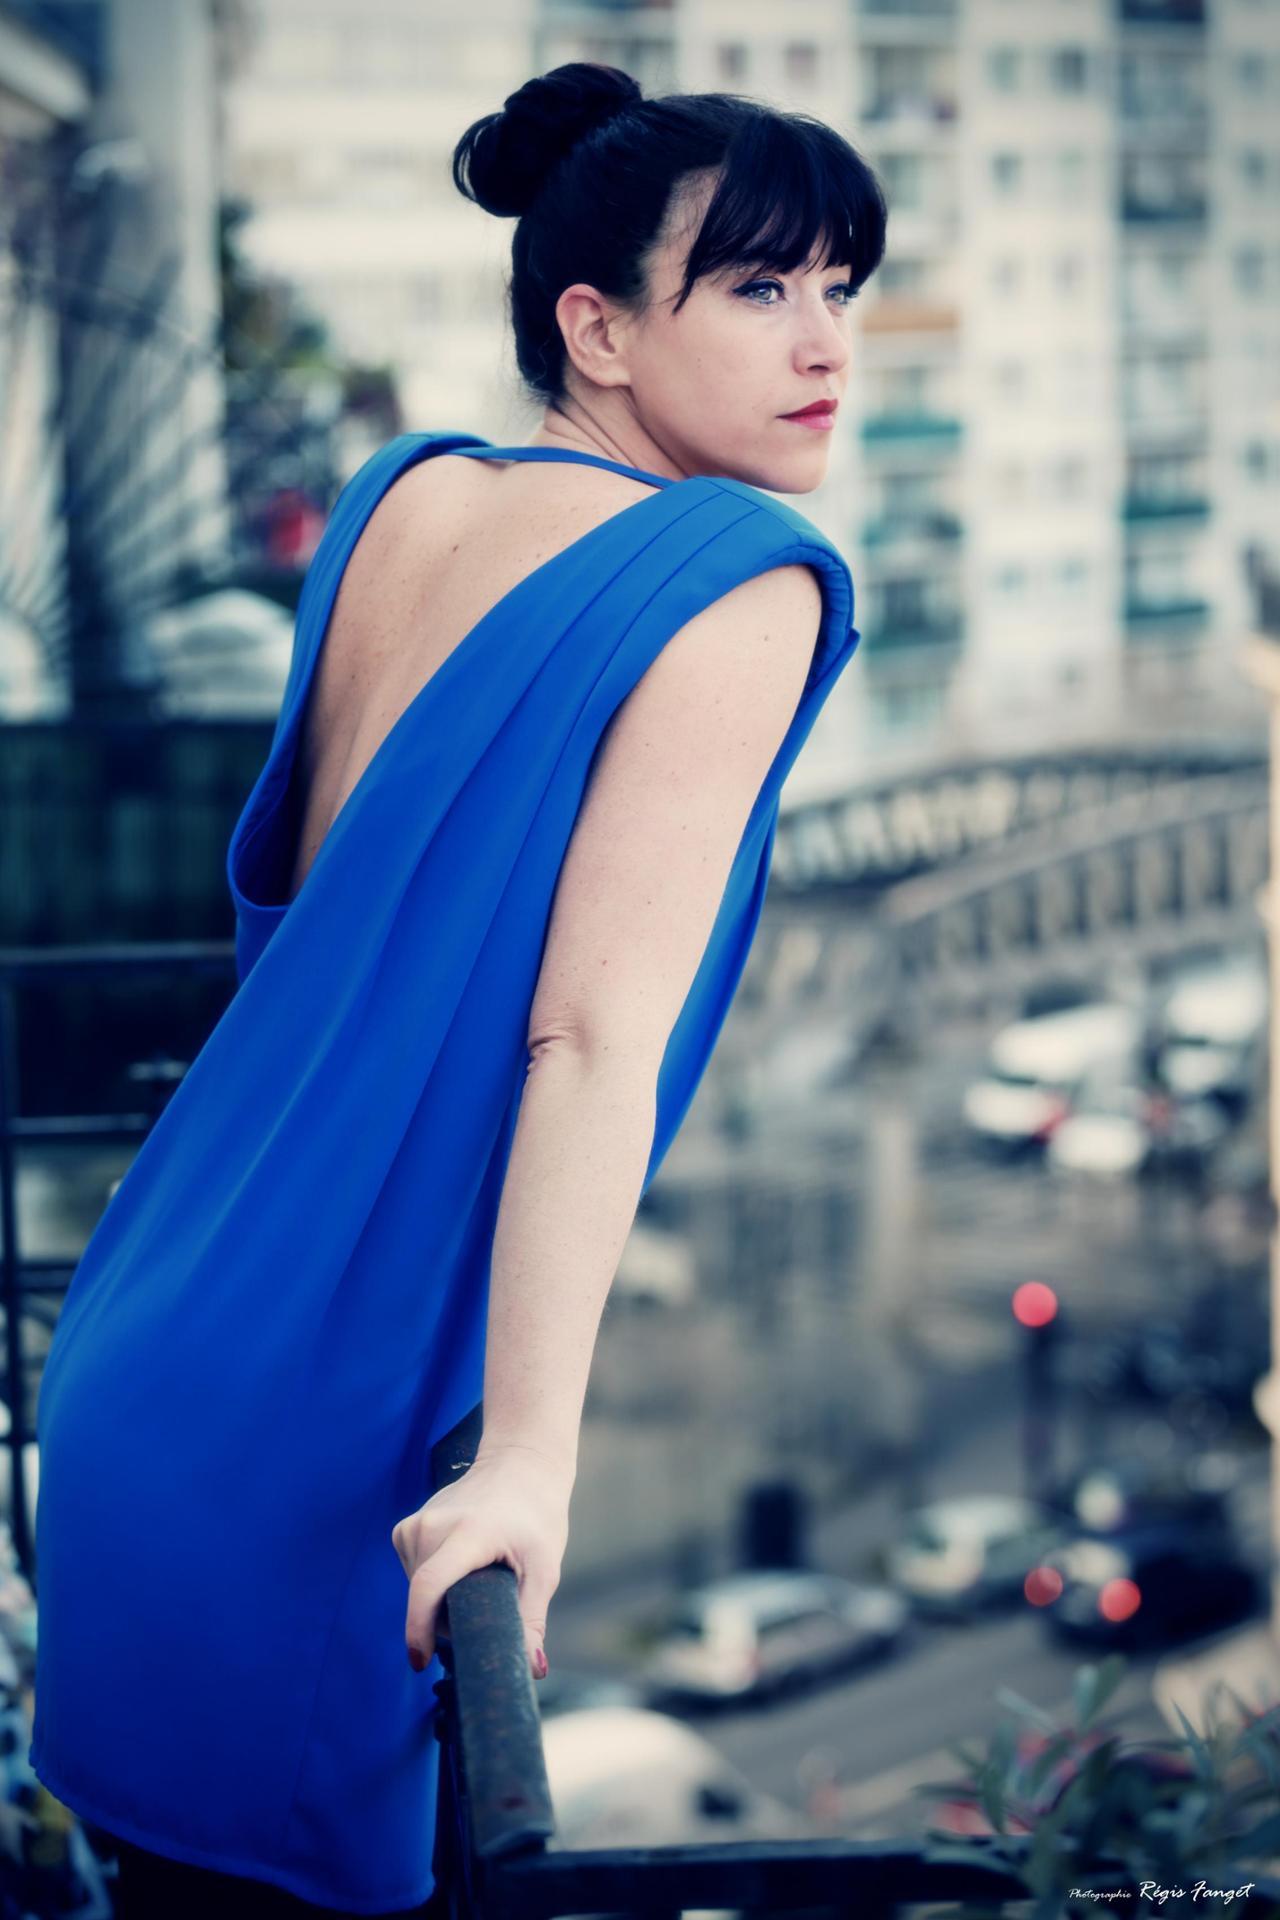 la pensive en robe bleue